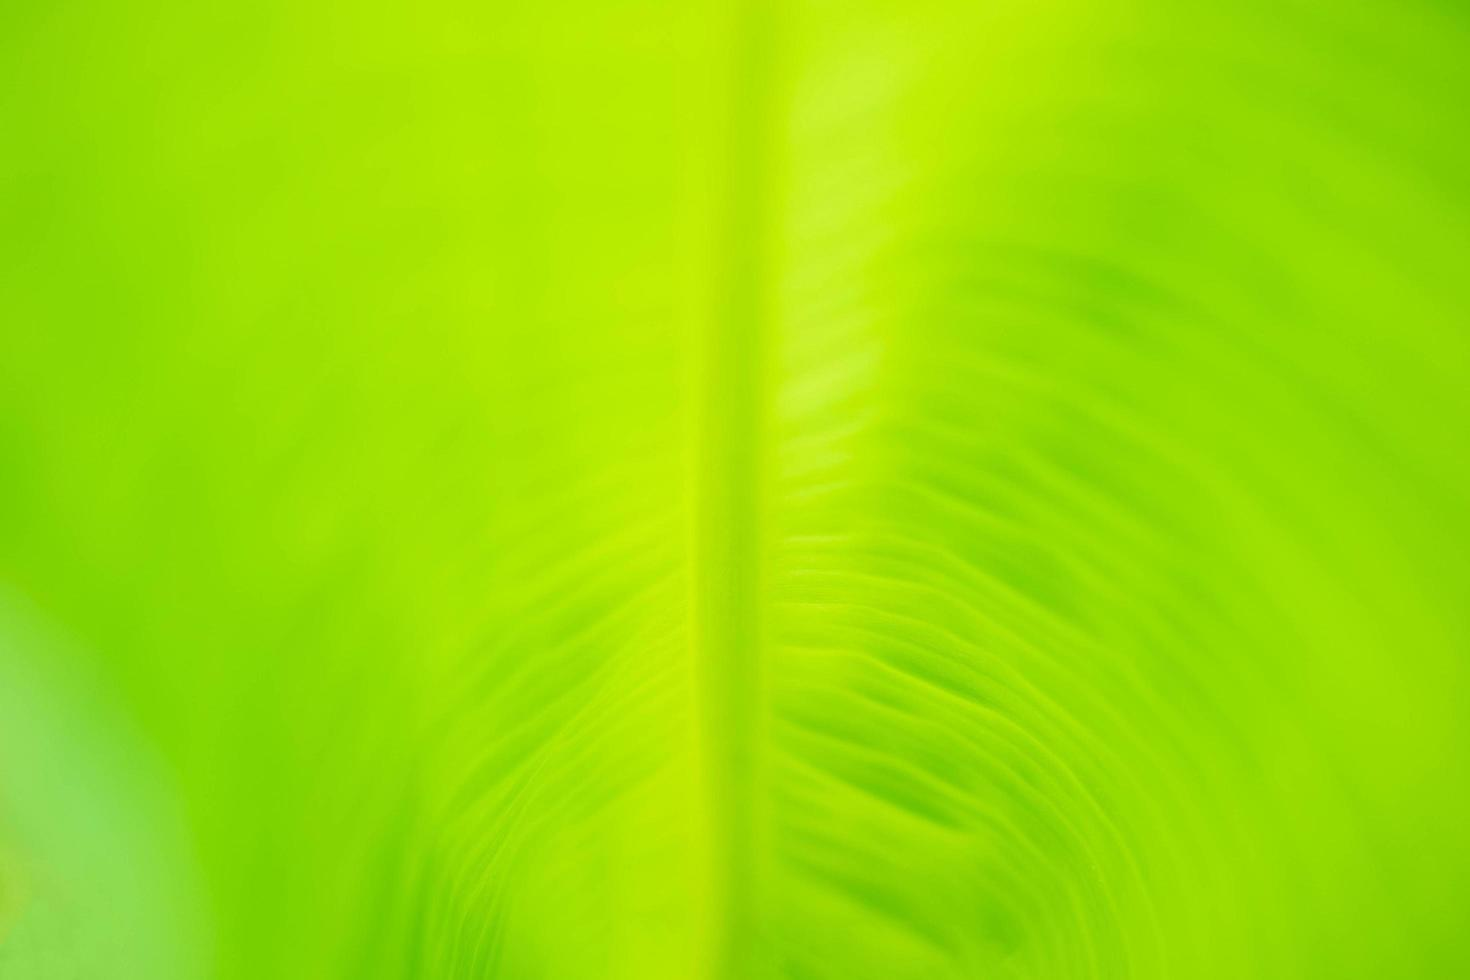 Green nature background. photo